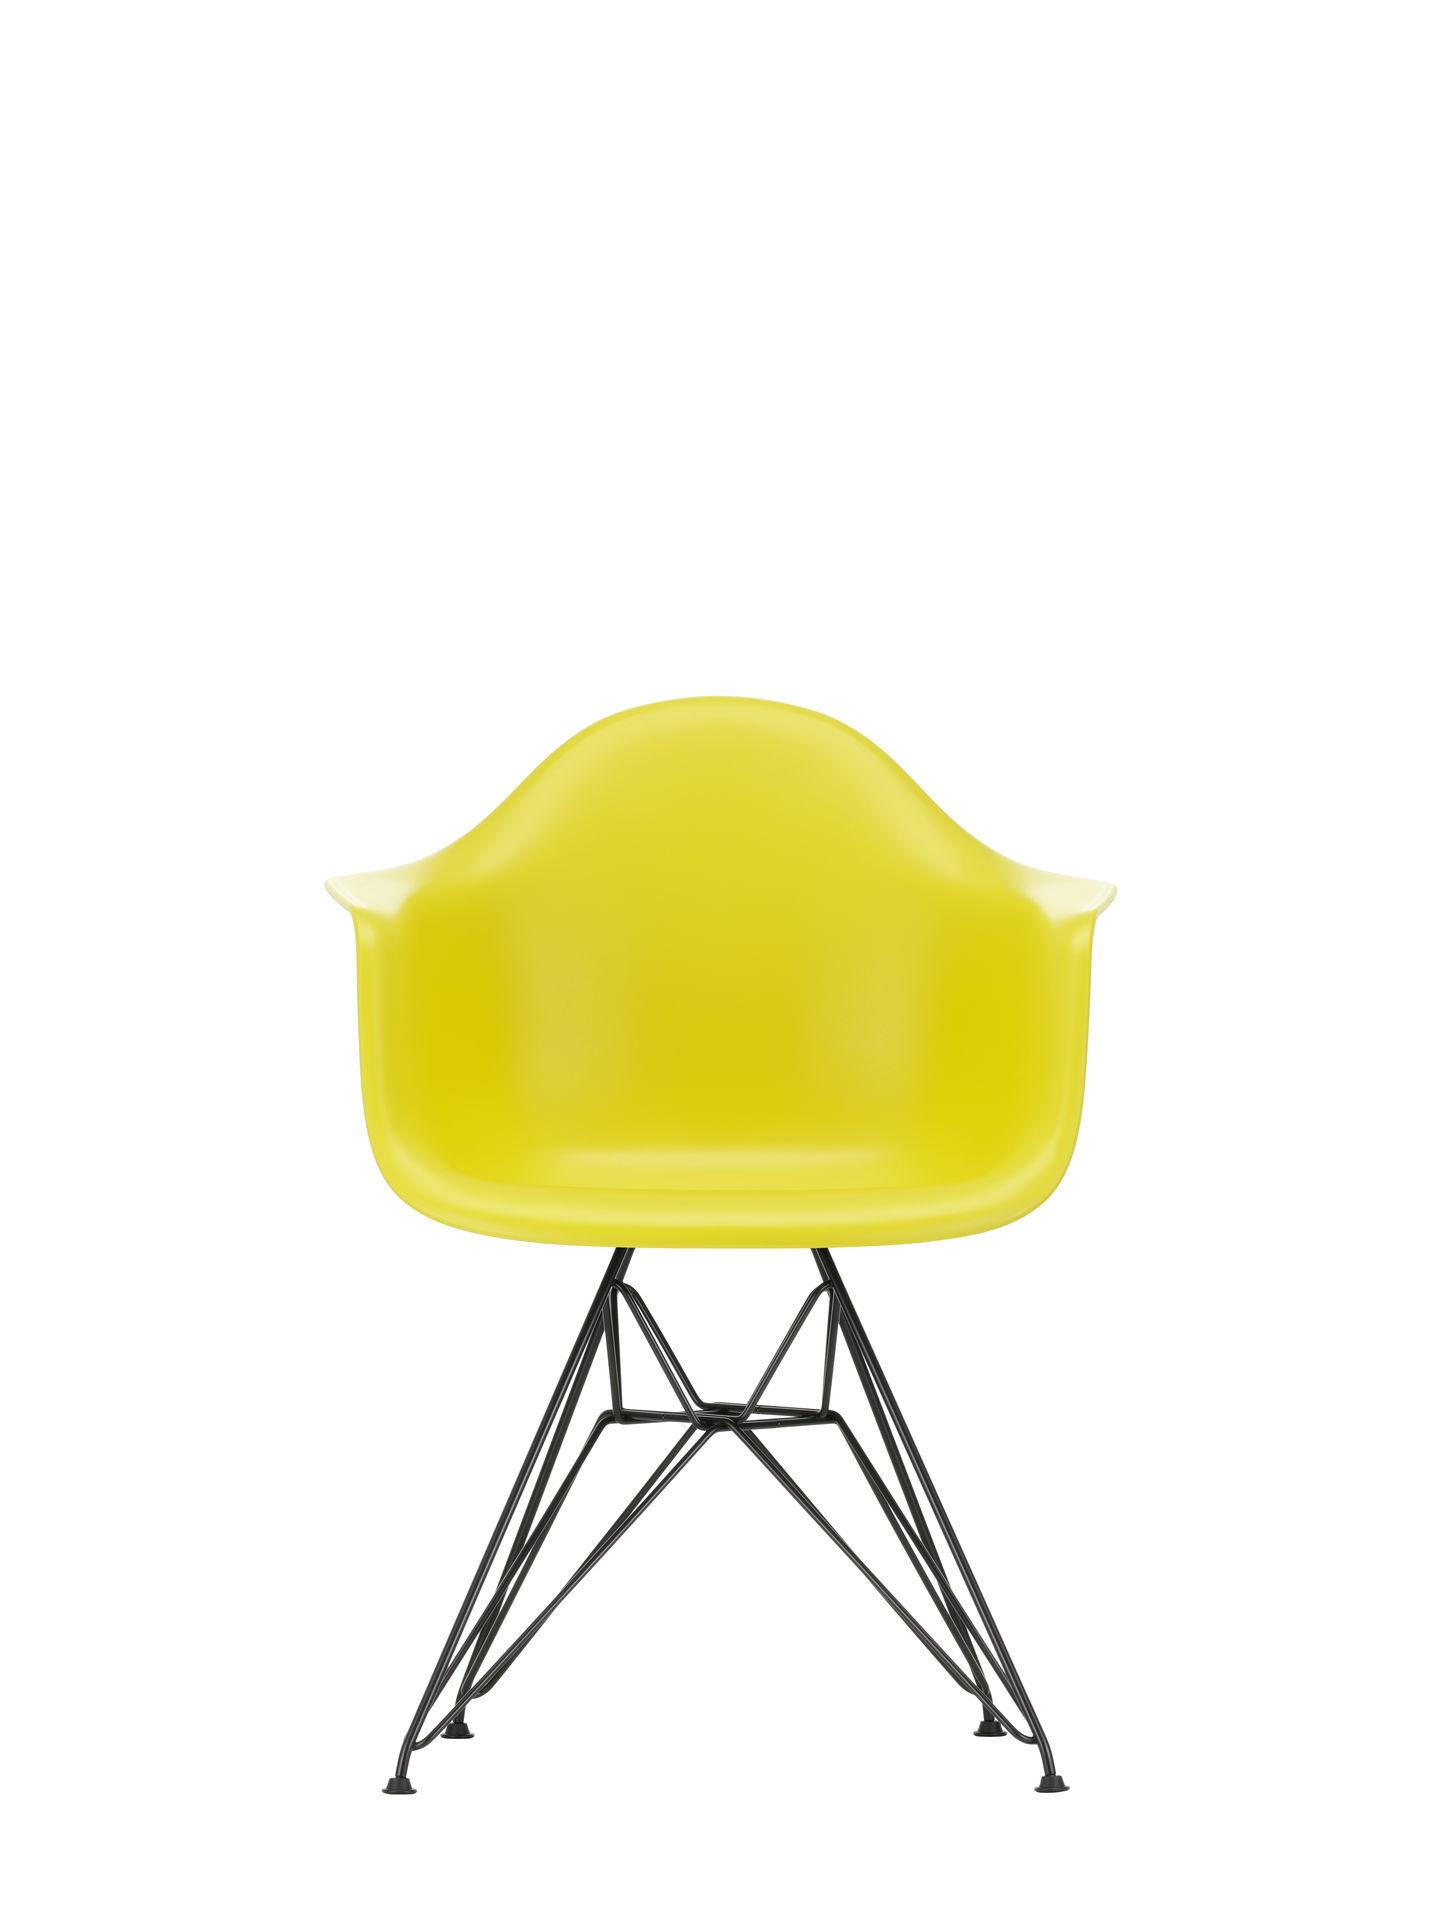 Eames Plastic Arm Chair DAR Stuhl Vitra Verchromt - Poppy red